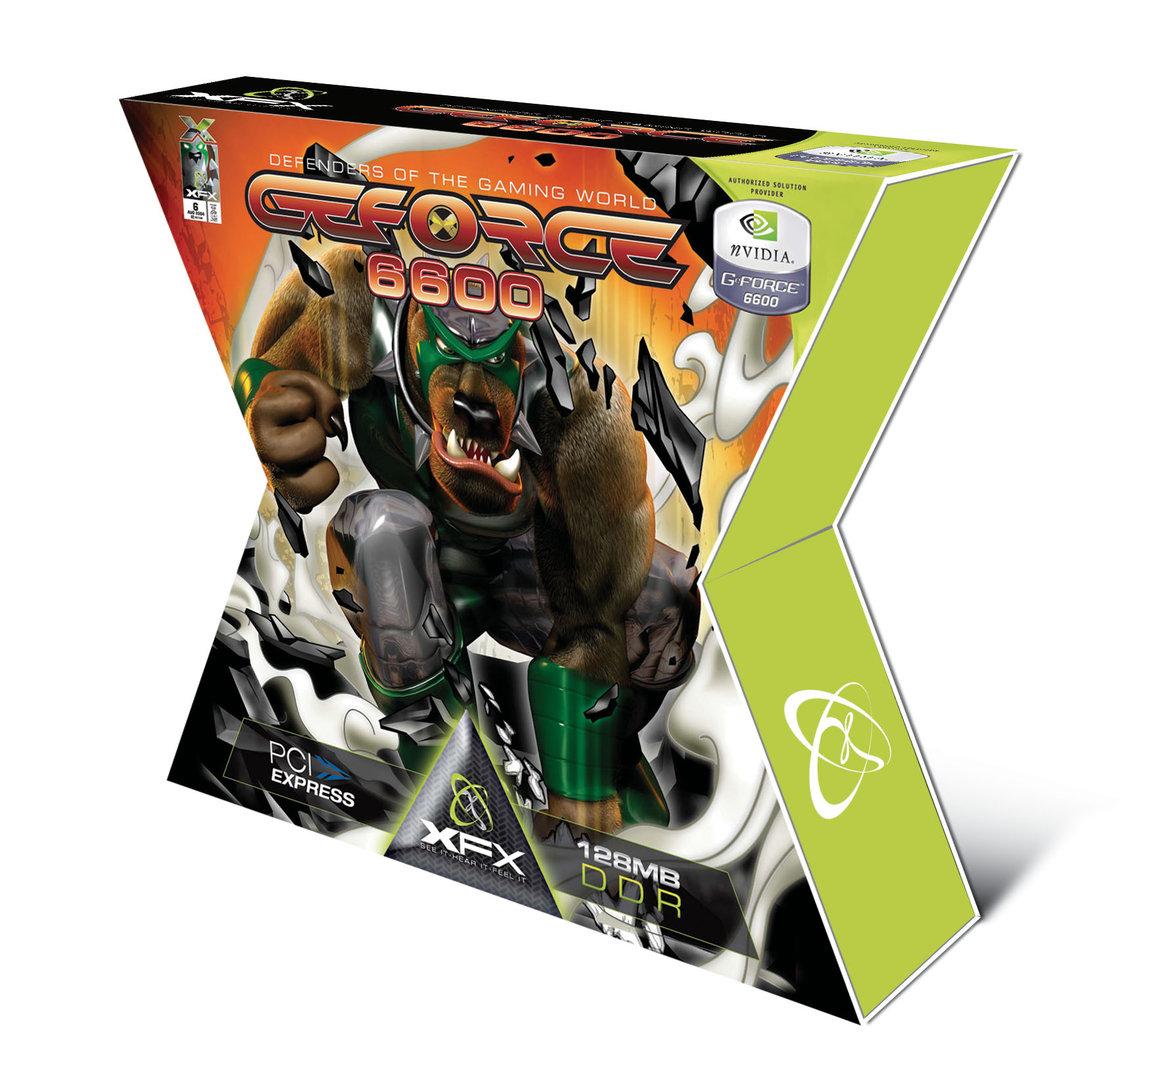 Verpackung der GeForce 6600